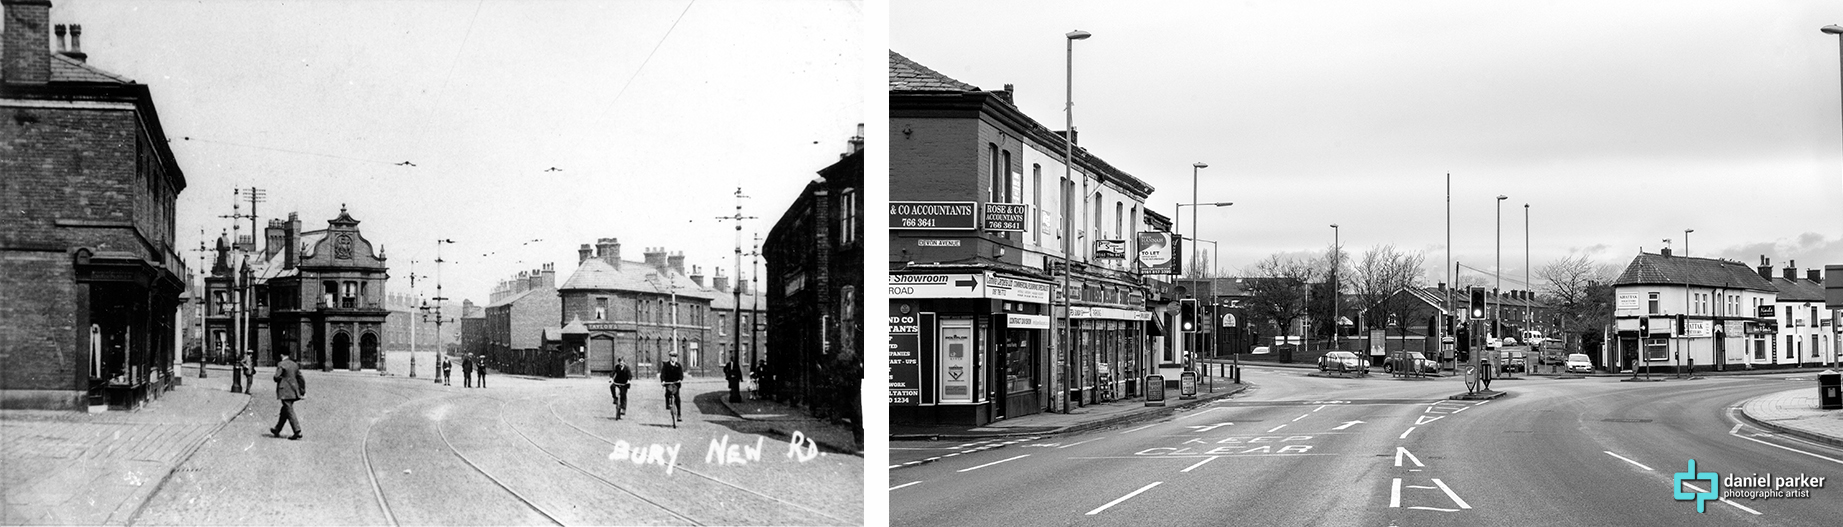 Bury New Road towards Lilyhill Street